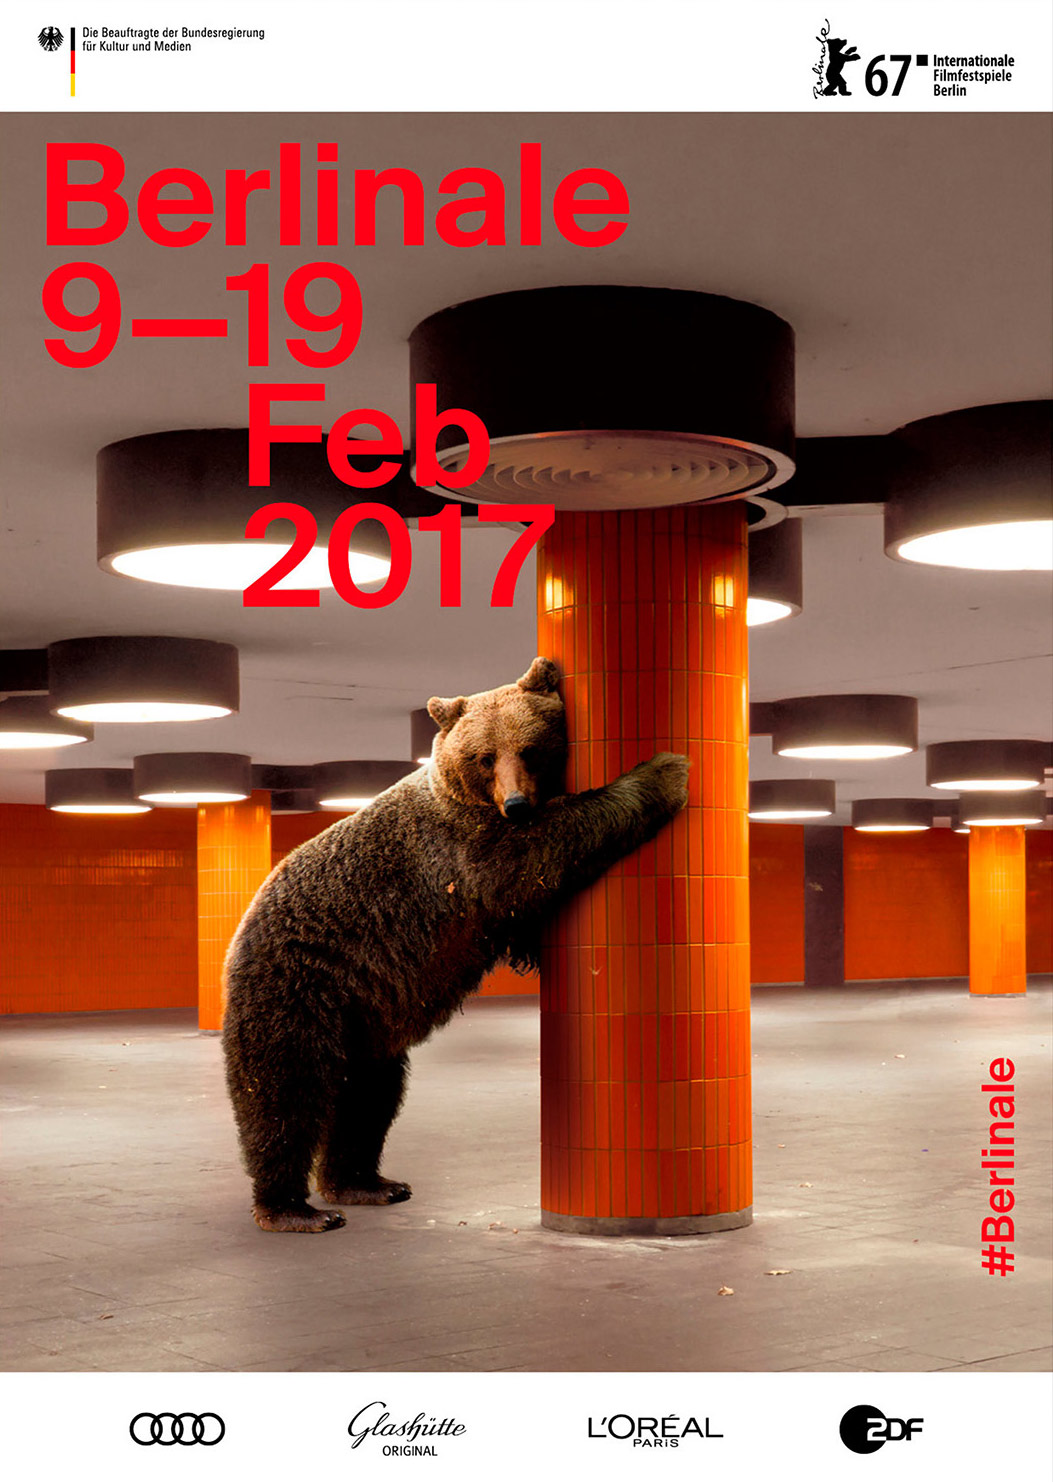 Festivalplakat zur Berlinale 2017